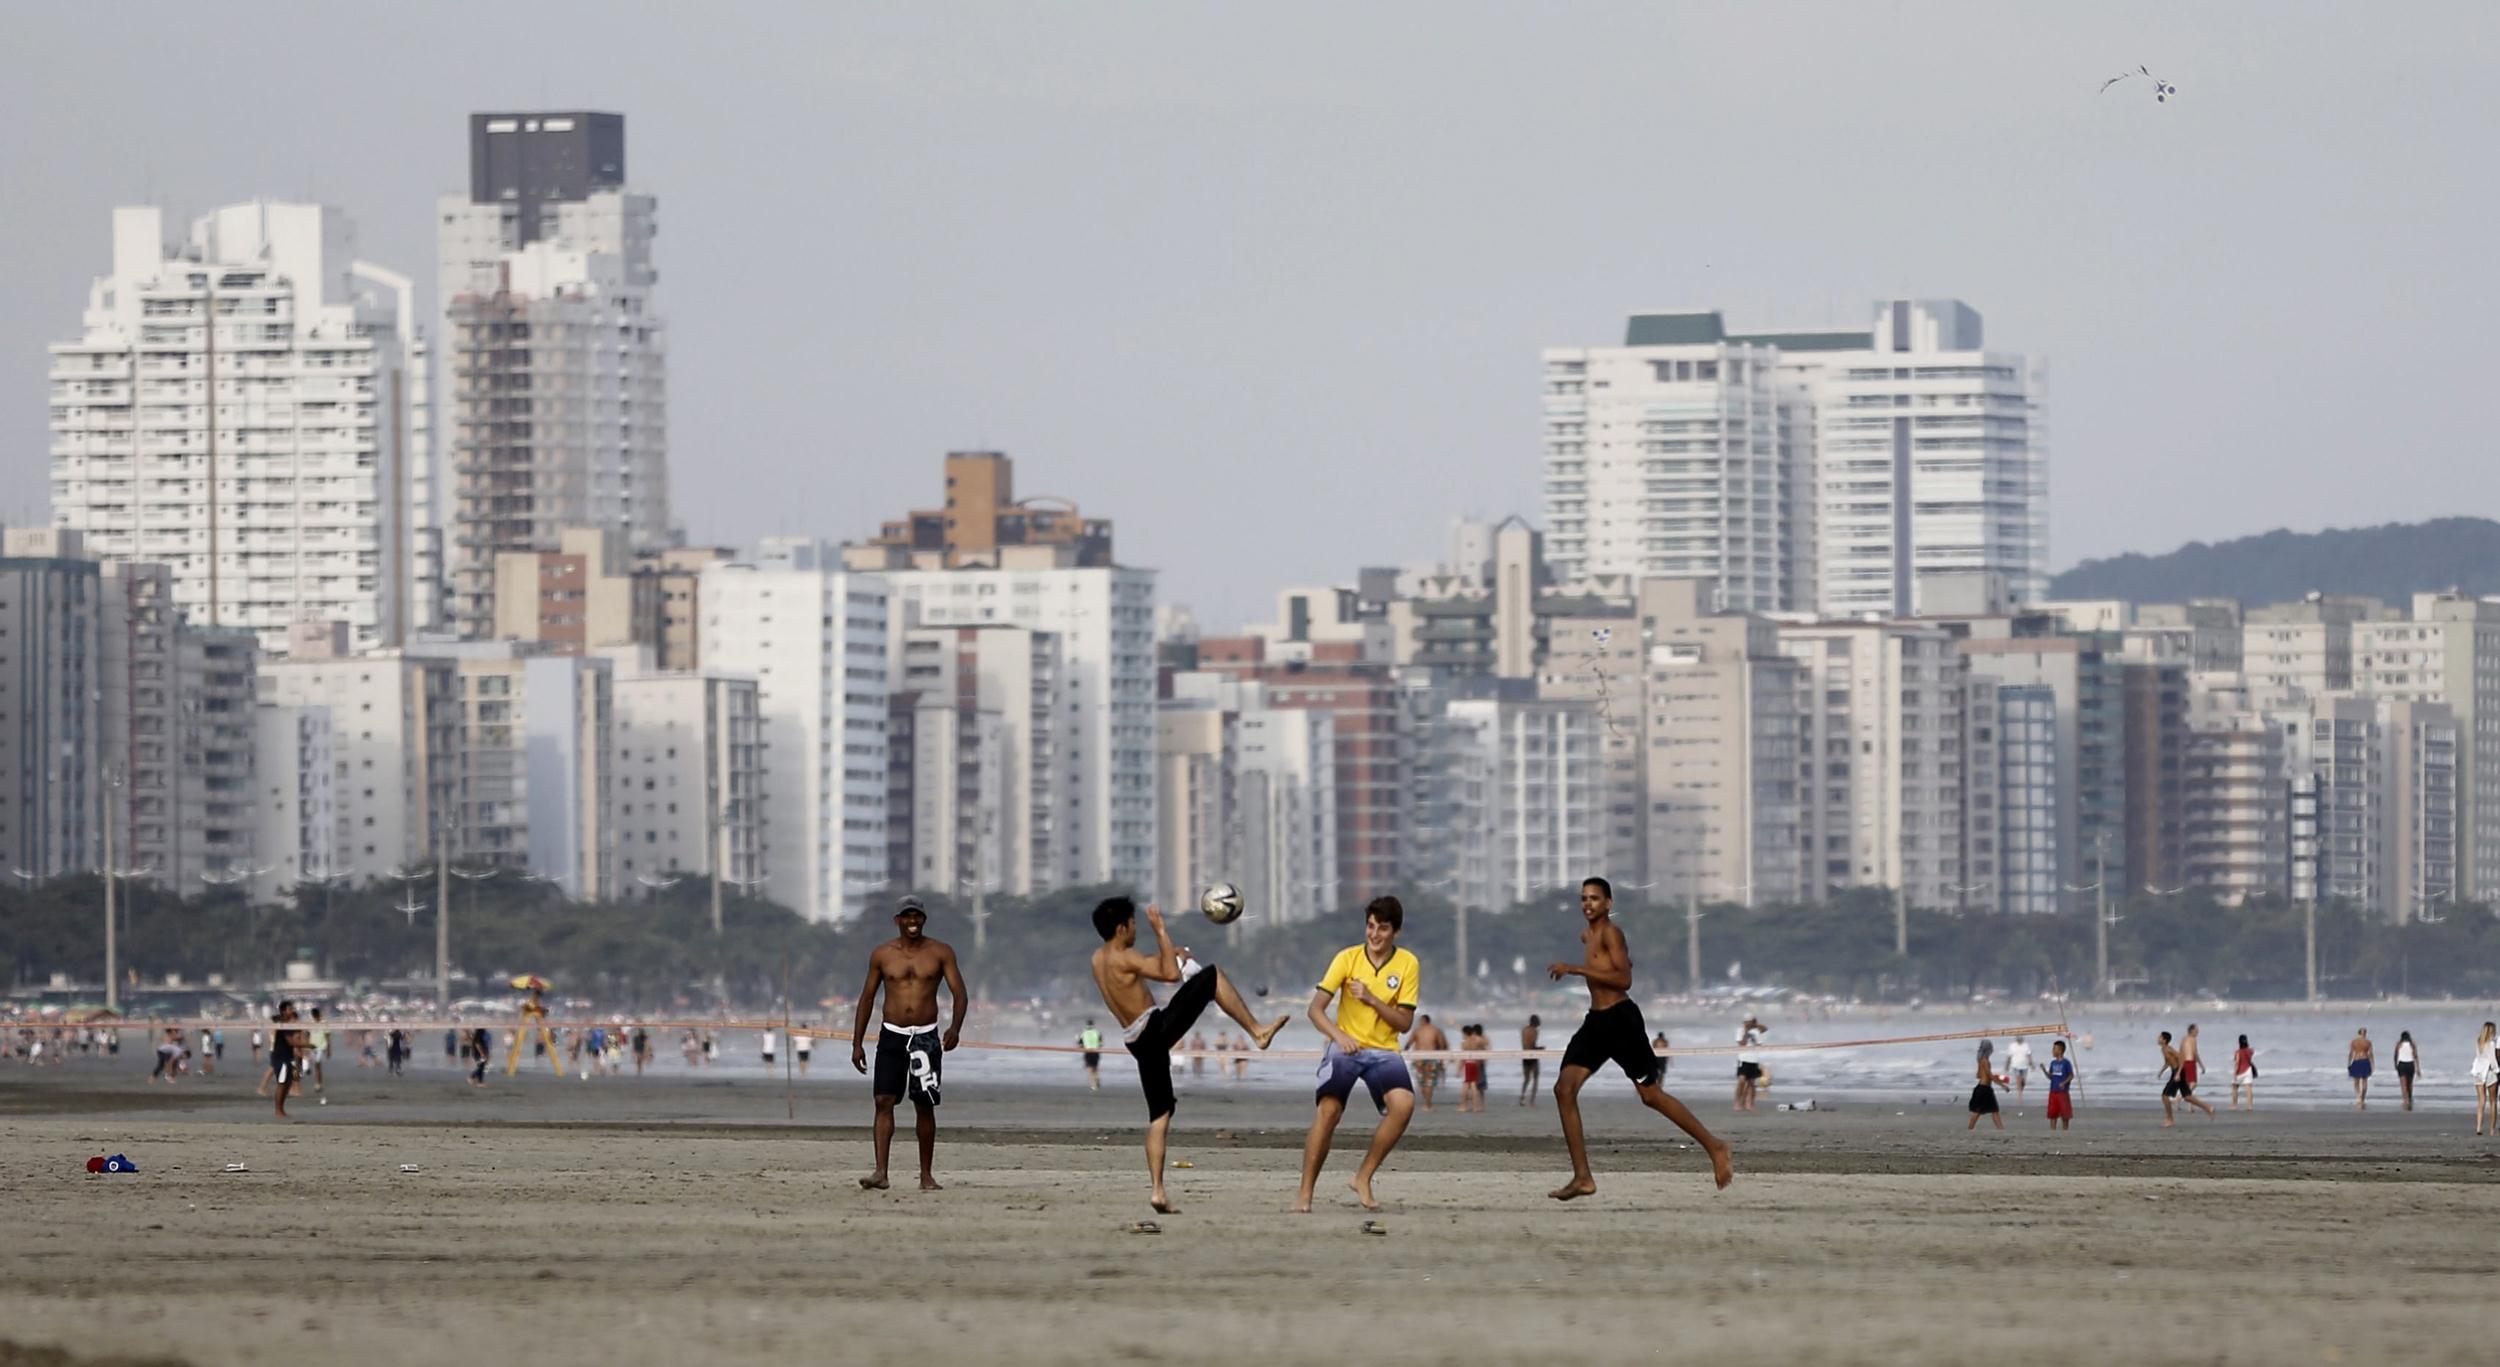 Image: Brazilian teenagers play soccer at a beach in Guaruja near Sao Paulo